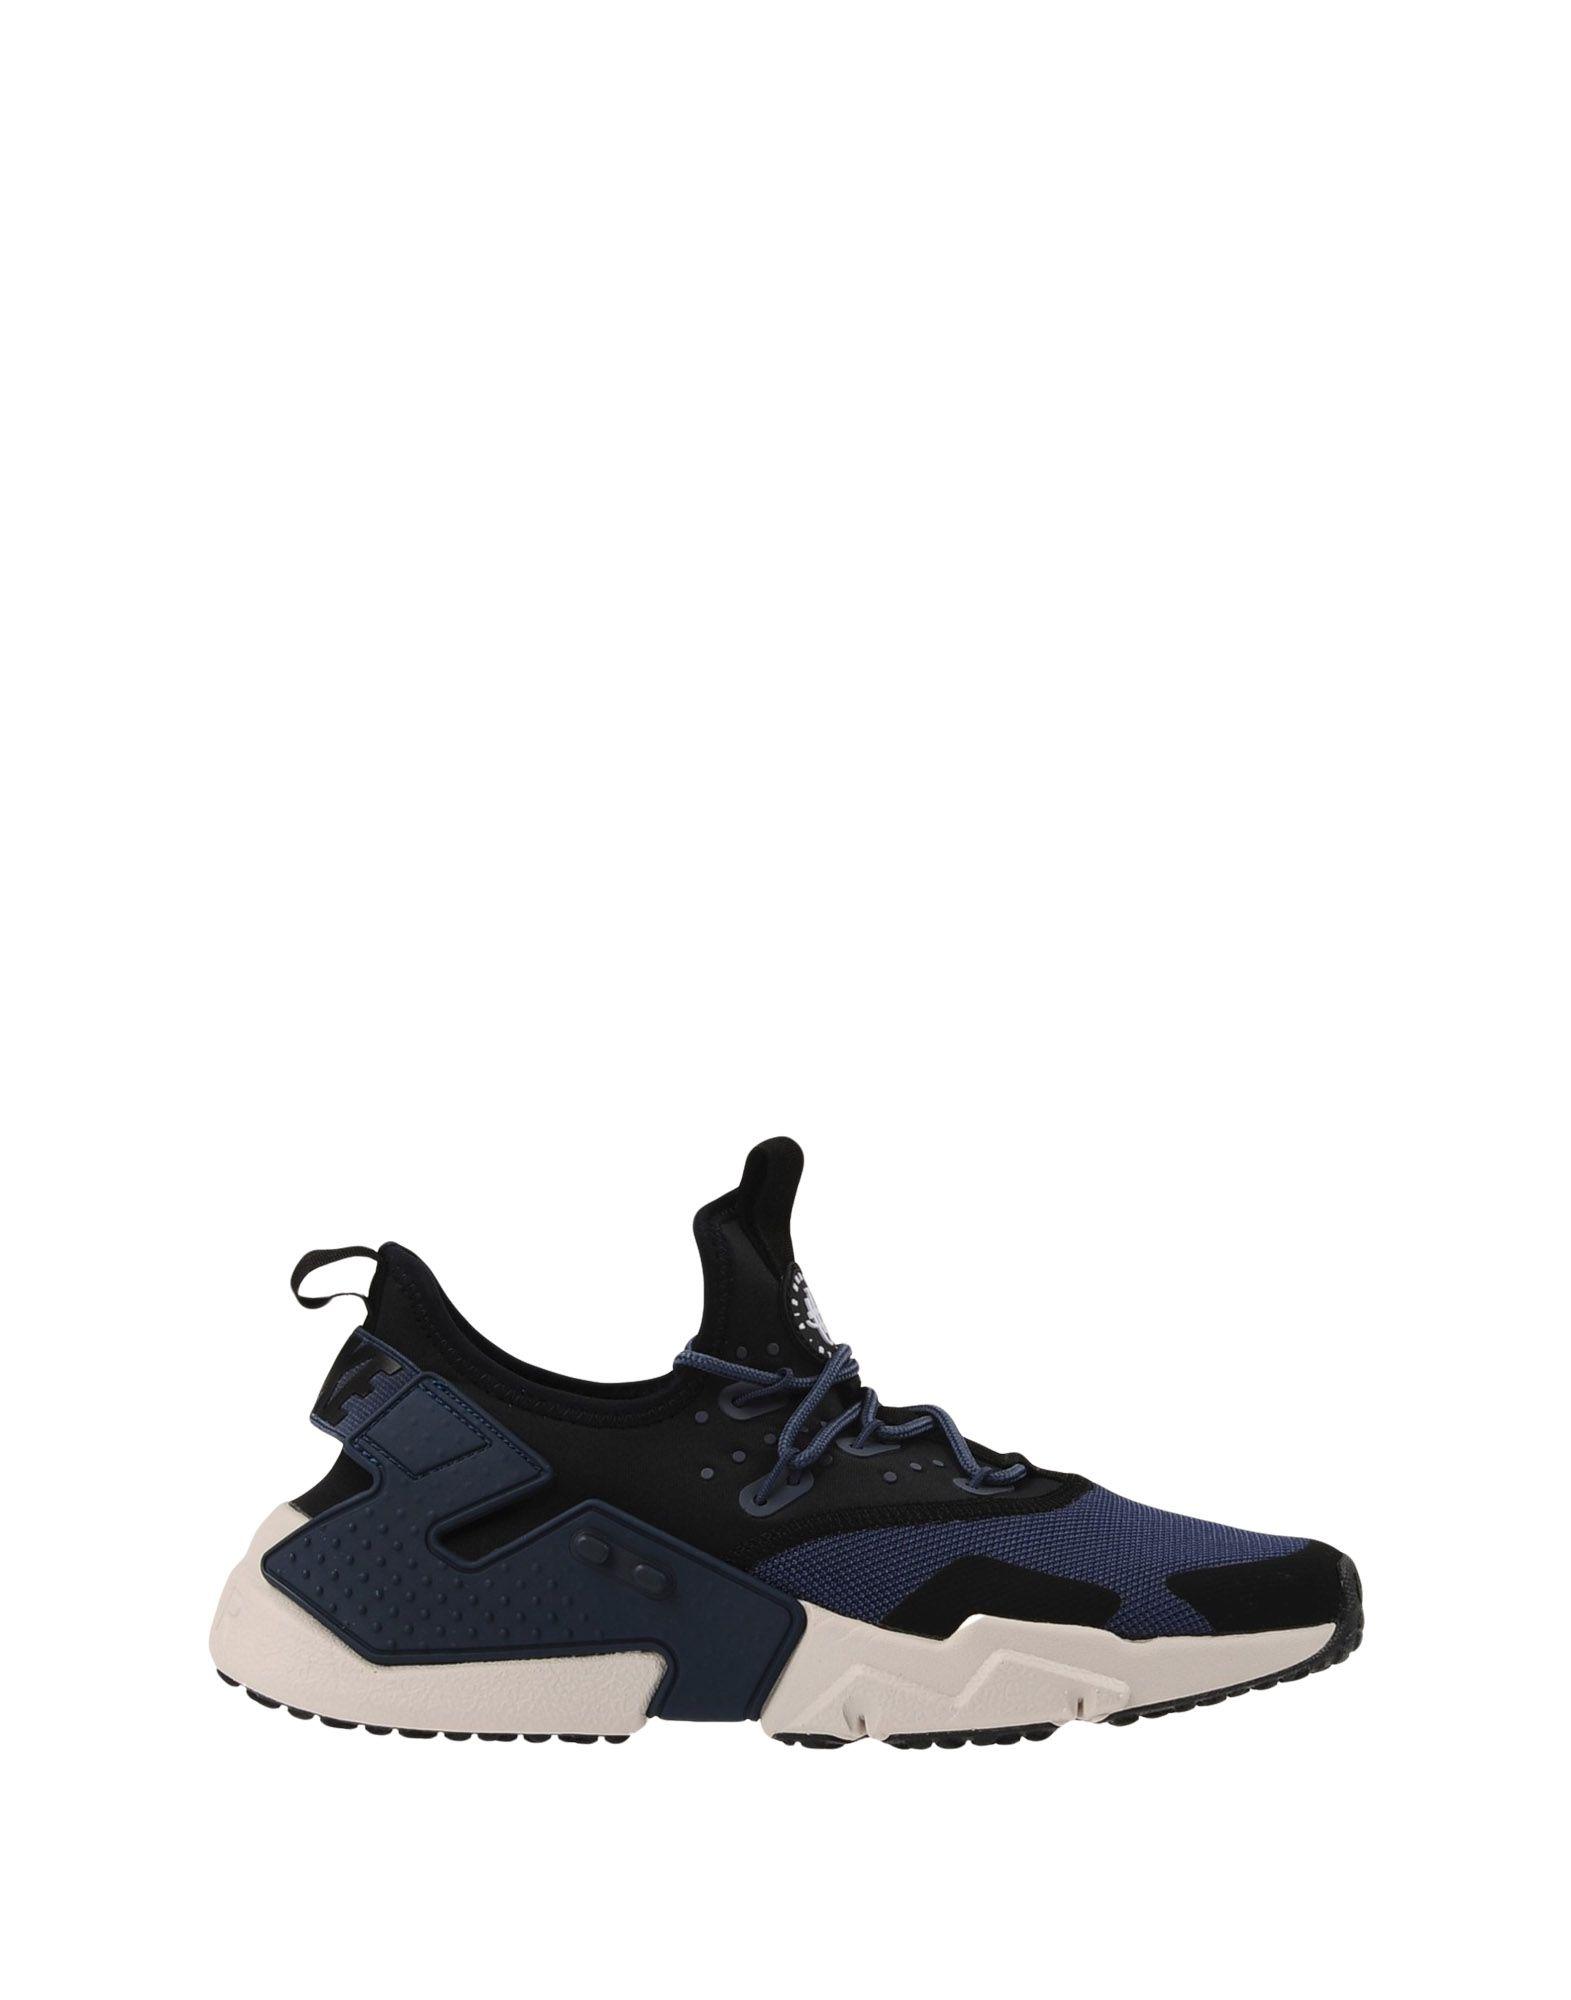 Sneakers Nike  Air Huarache Drift - Homme - Sneakers Nike sur